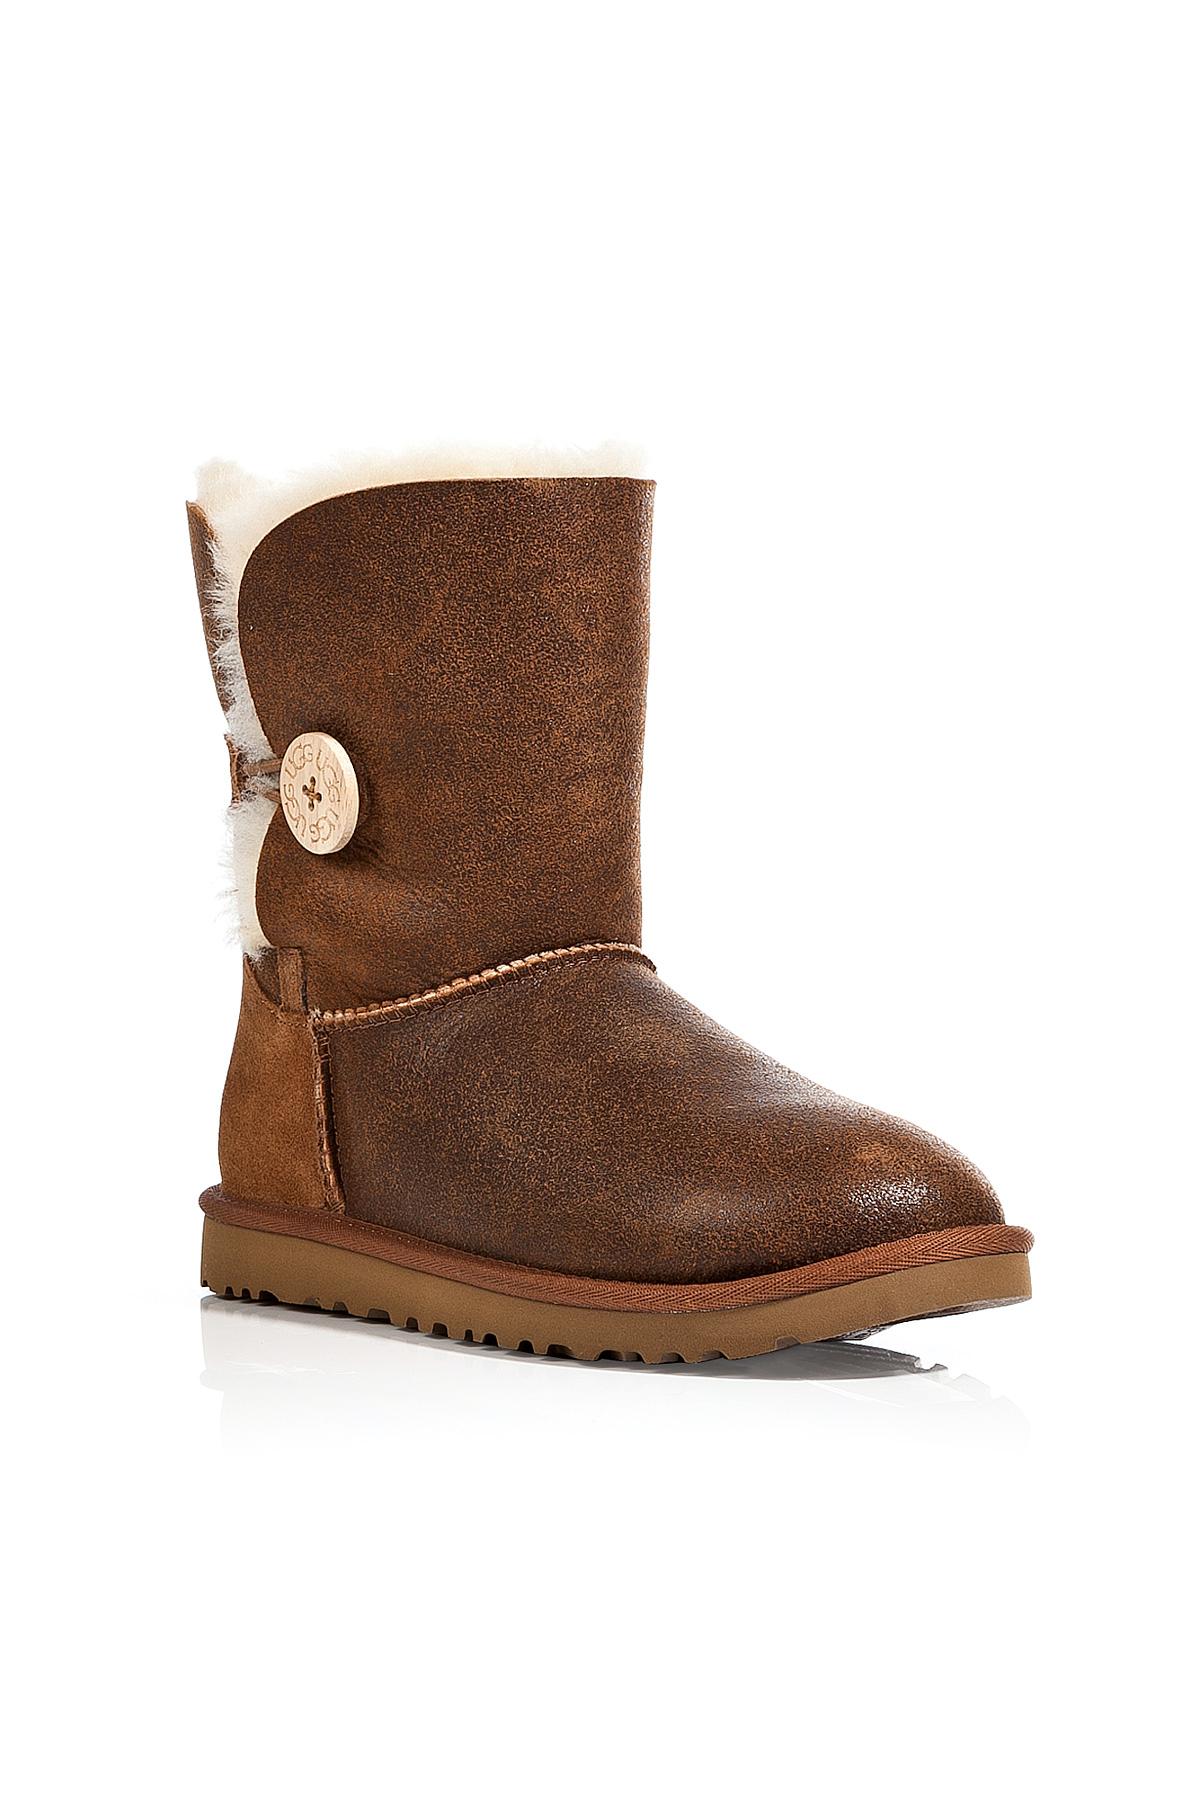 chestnut ugg australia boots